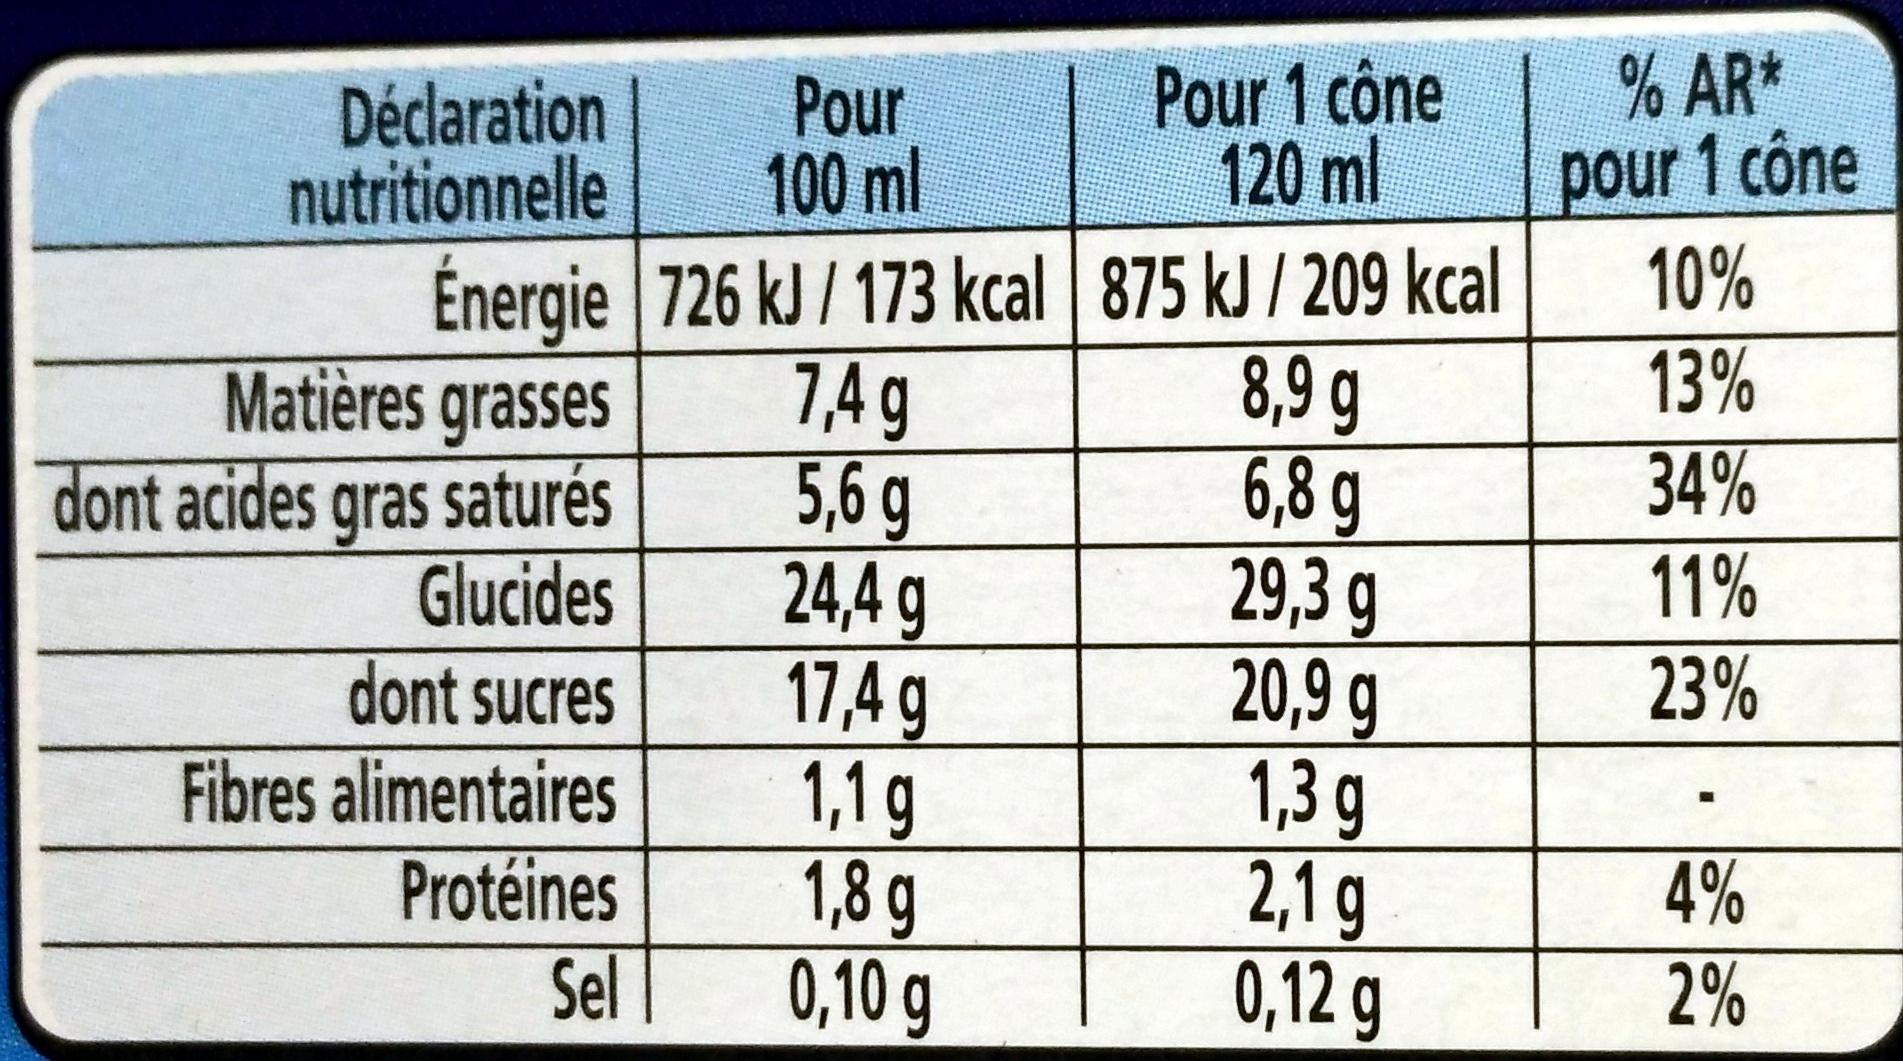 Extrême Café - Nutrition facts